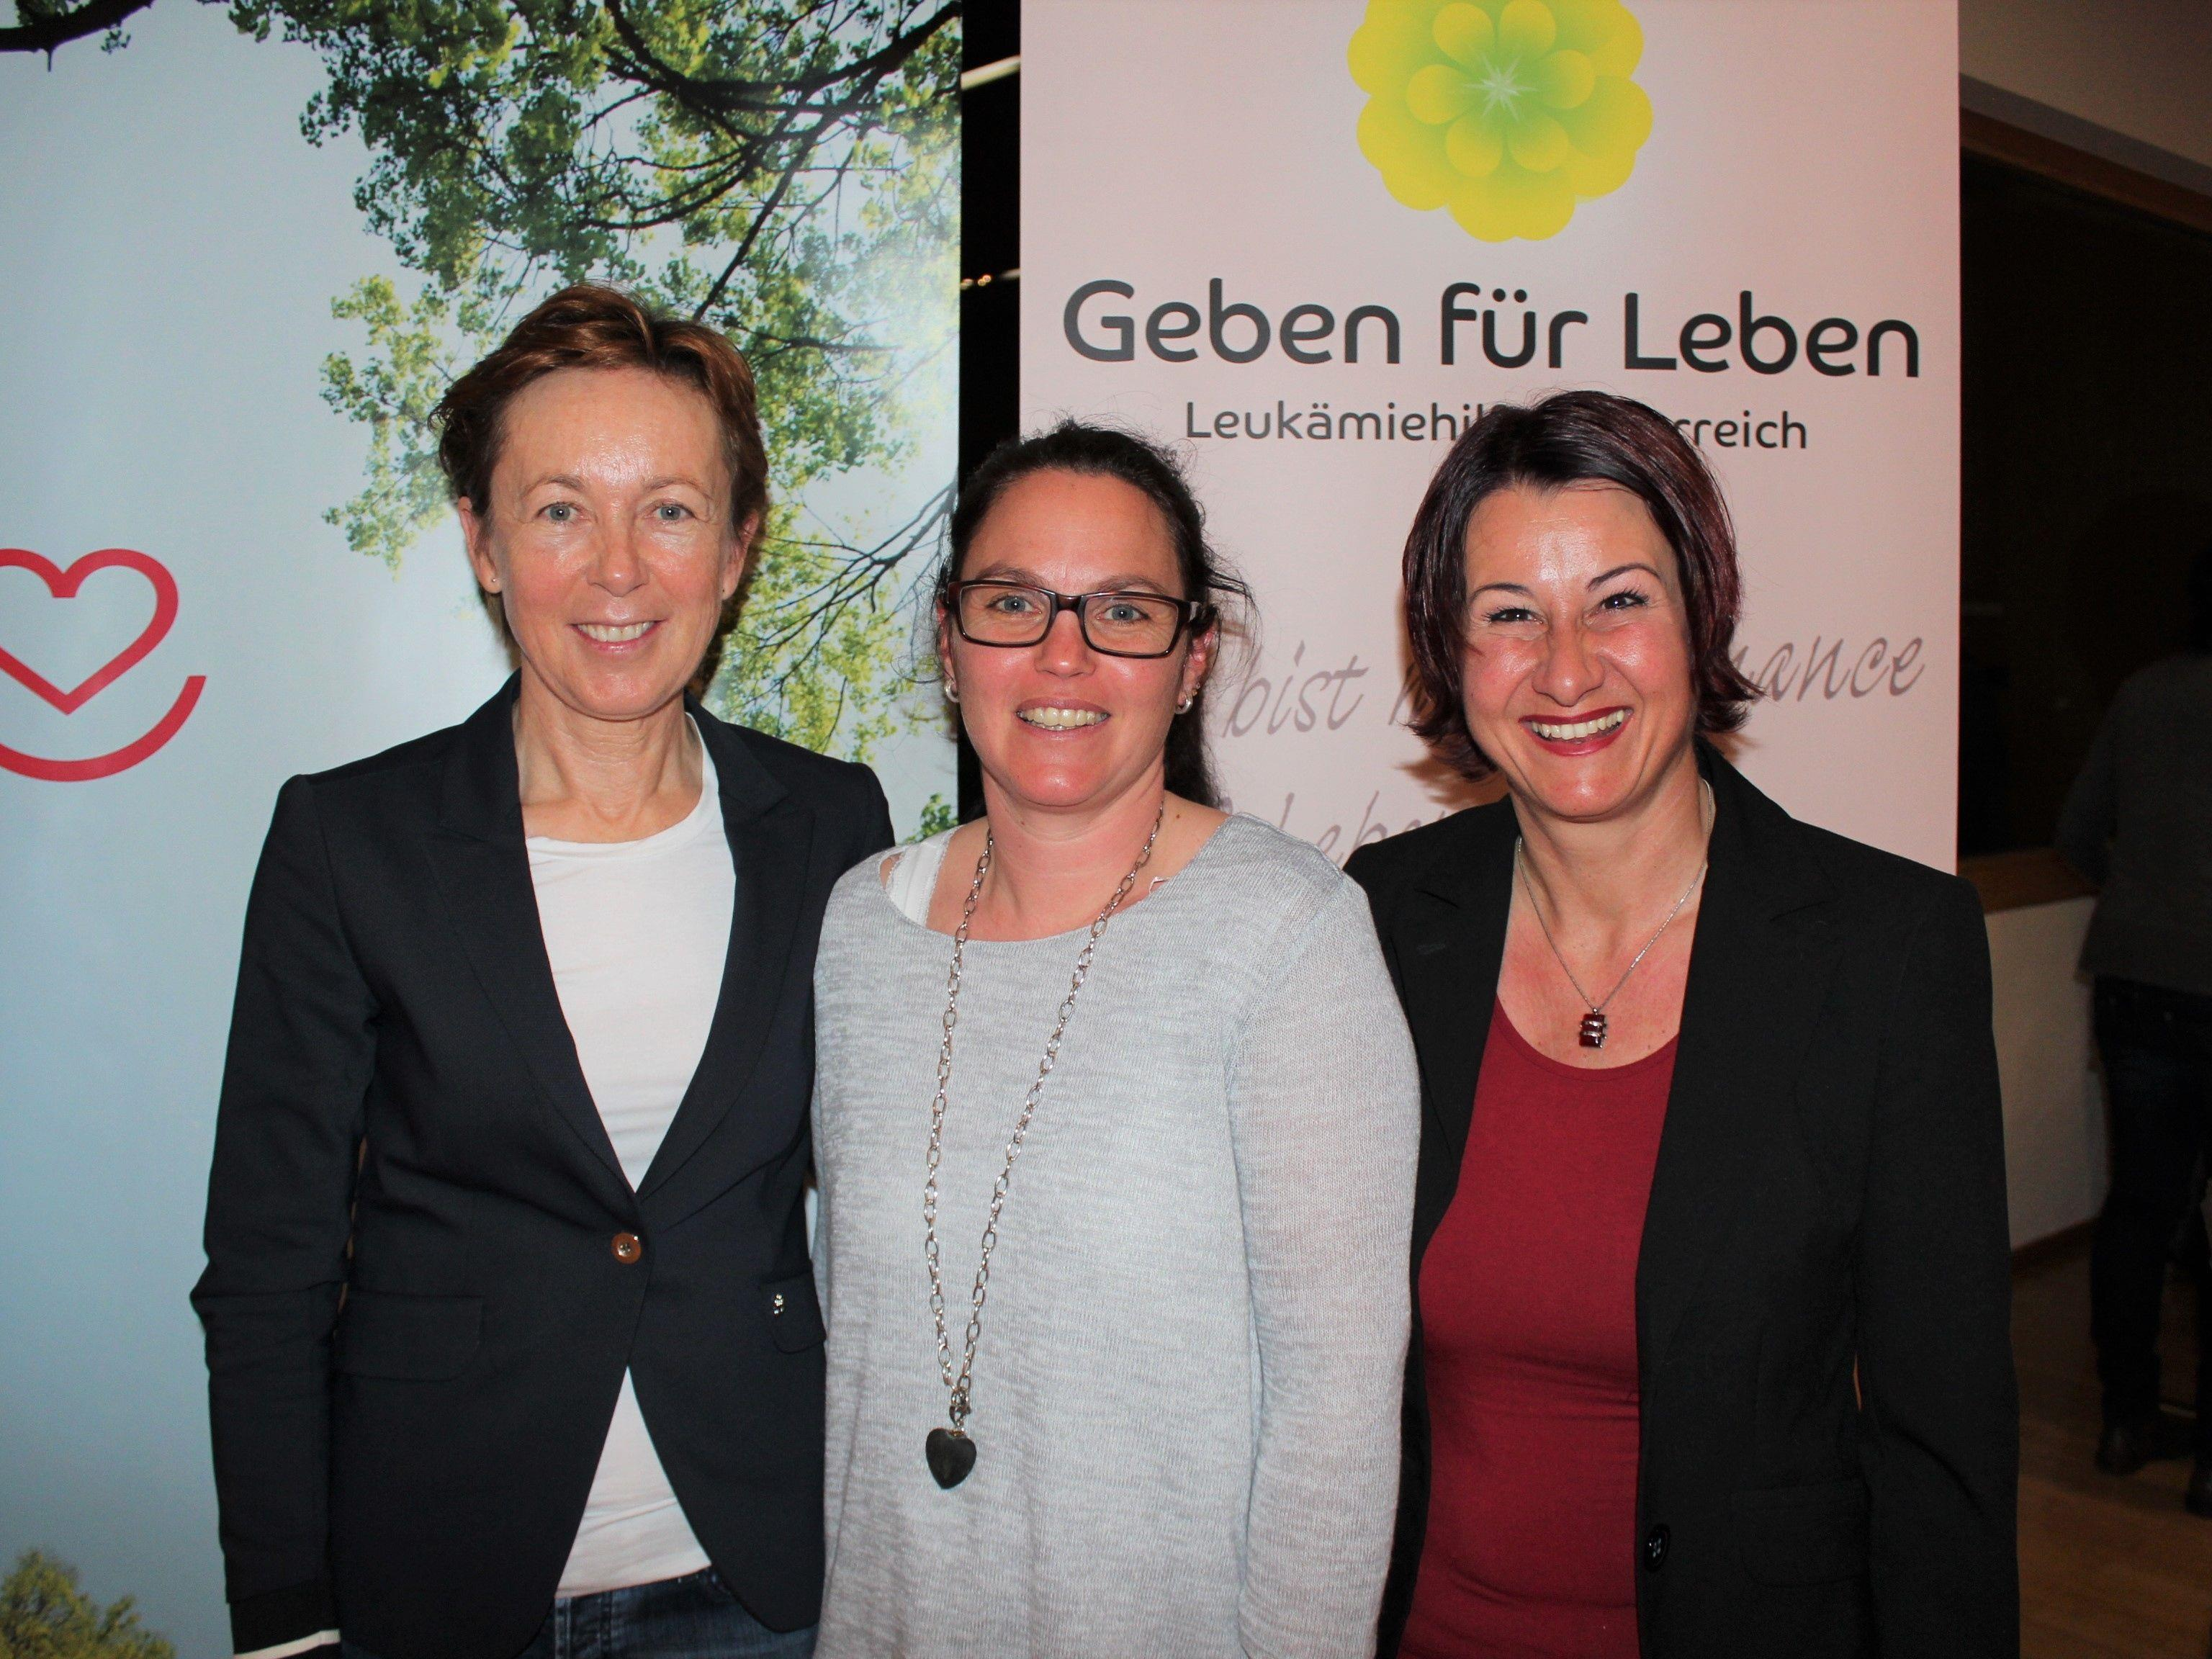 Marianne Huber, Obfrau Claudia Gunz und Susanne Marosch.